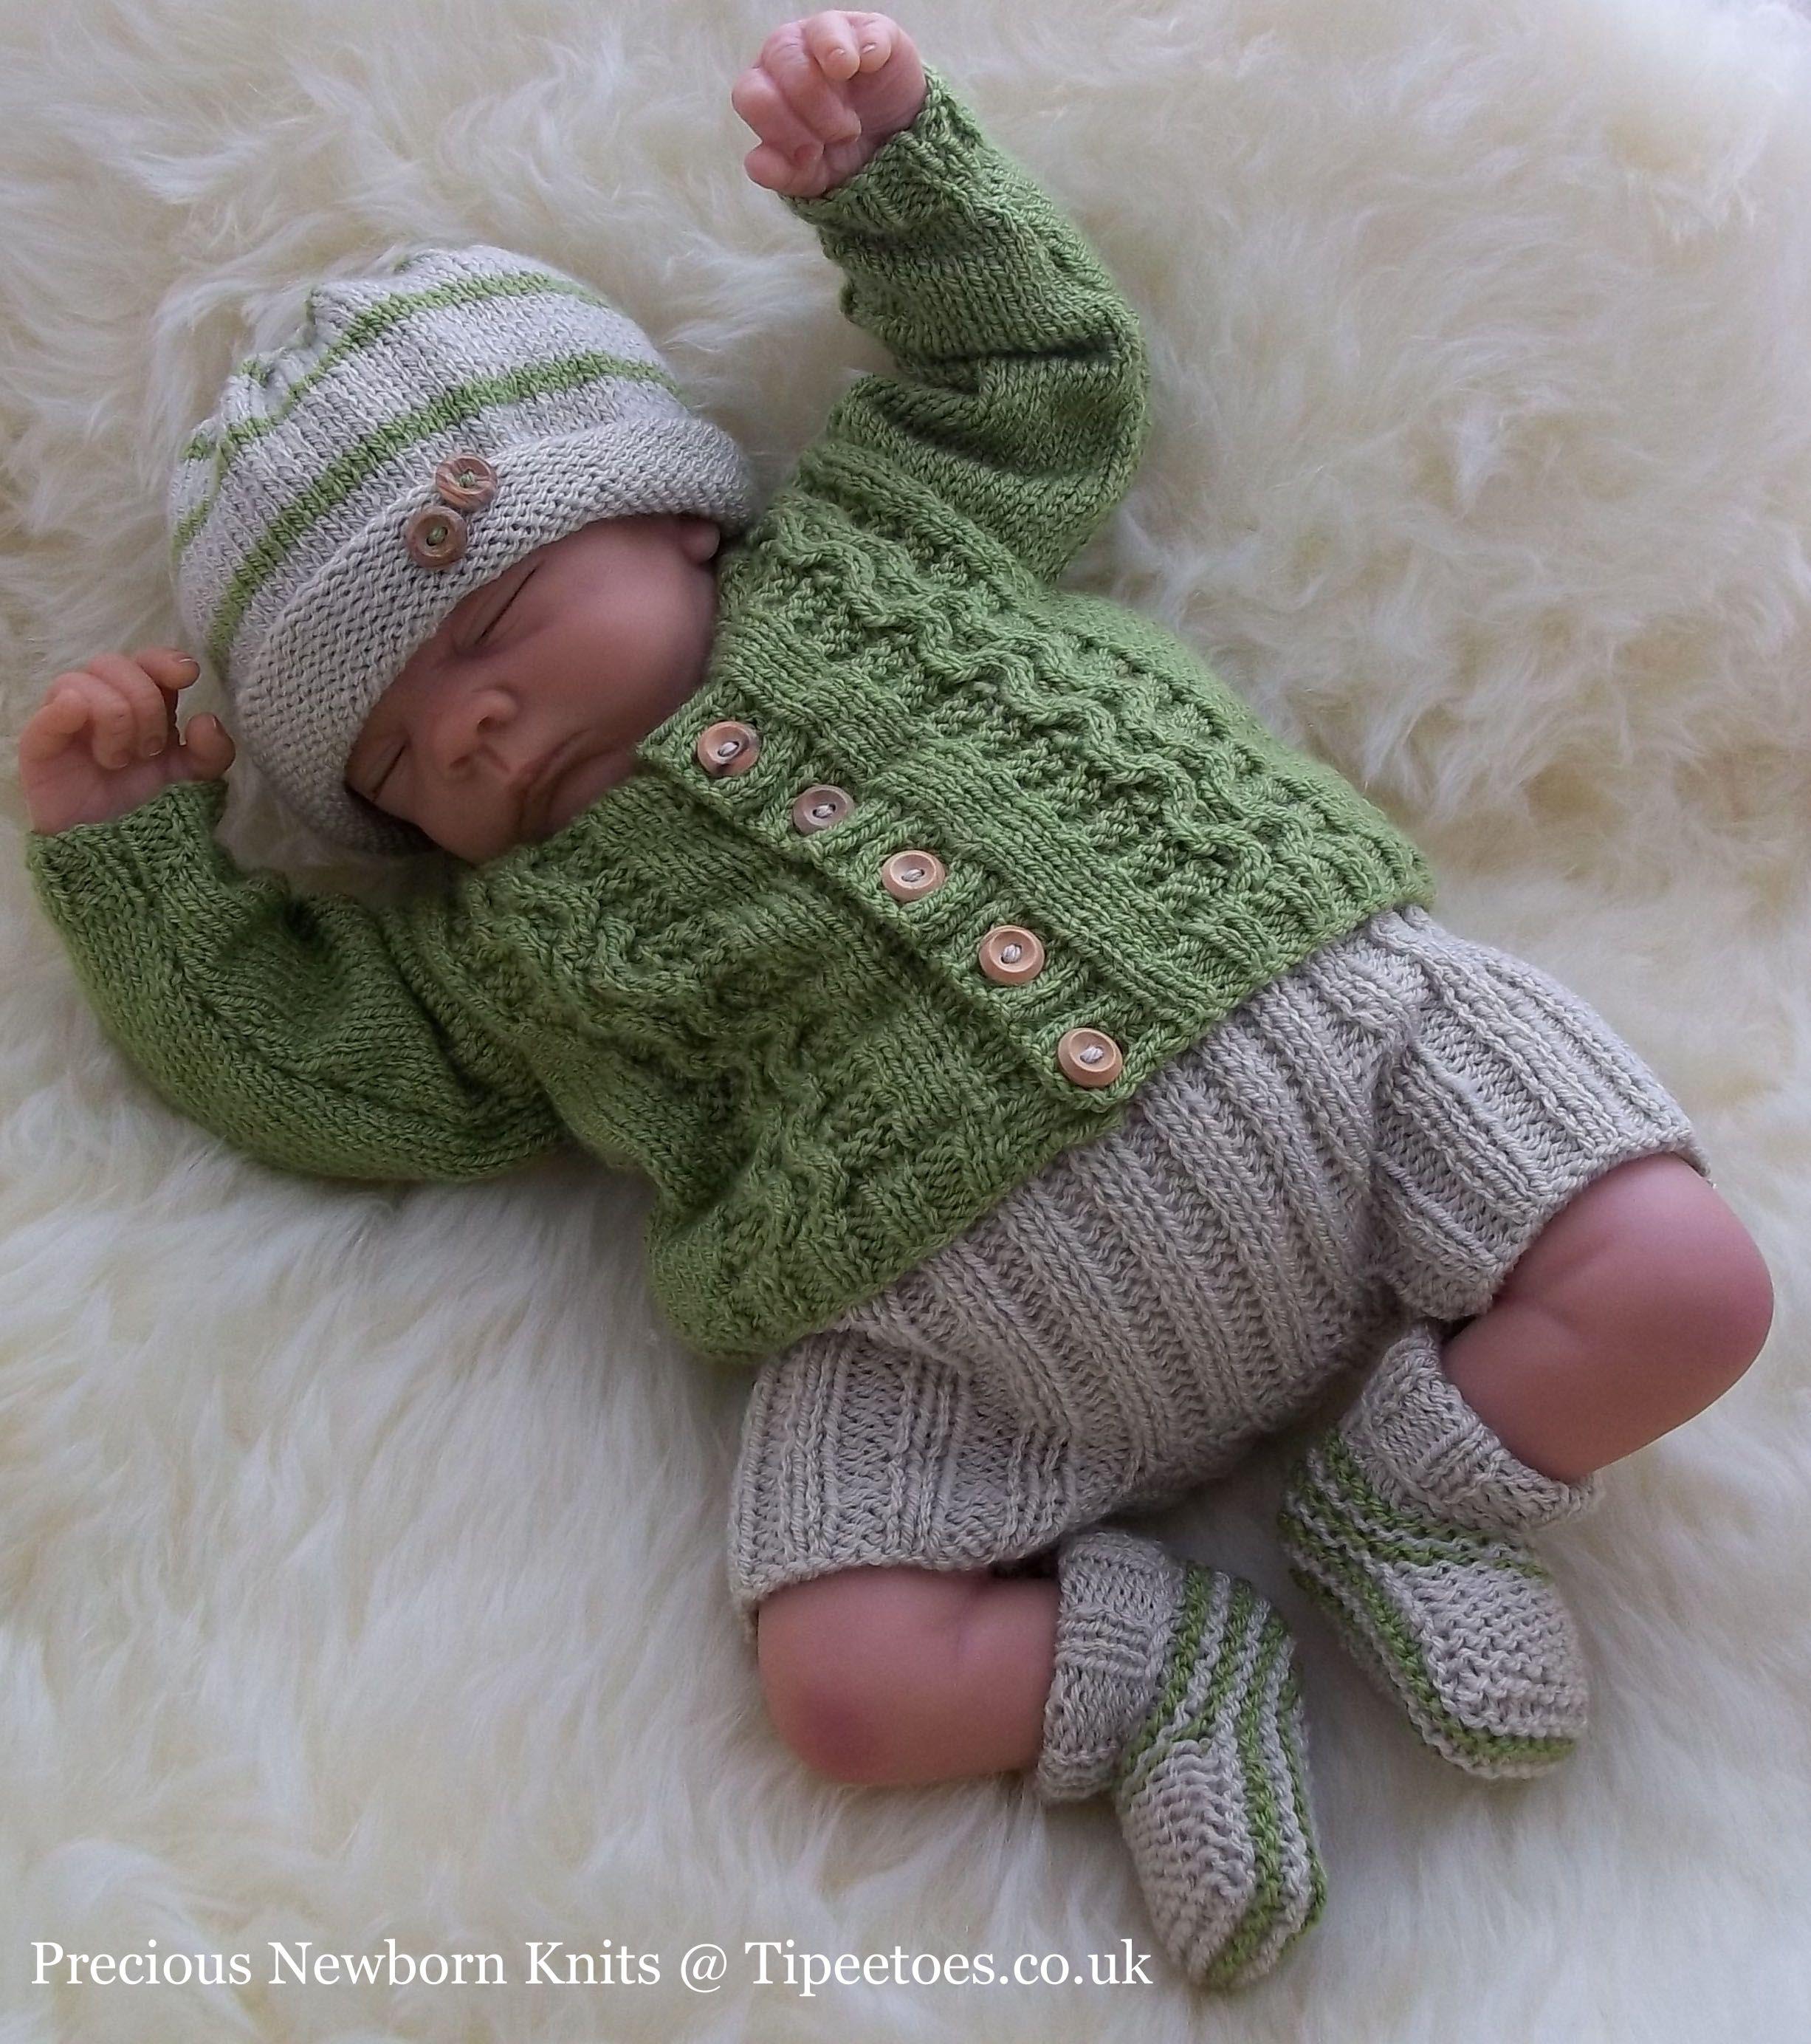 Baby Knitting Pattern TO KNIT Boys Reborn Dolls Cardigan Trousers ...